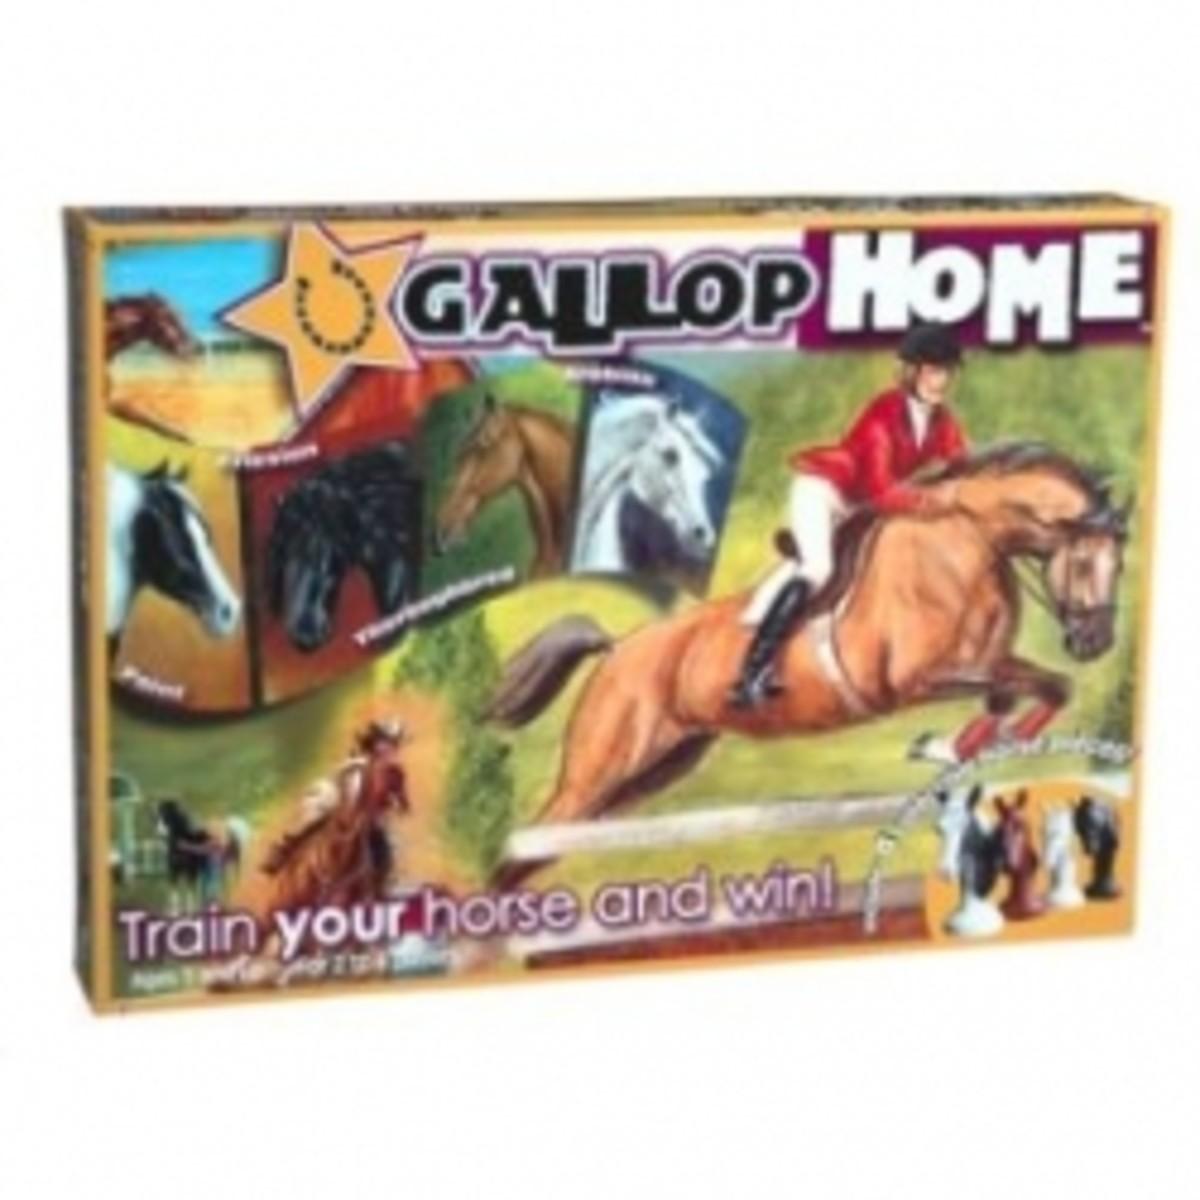 gallophome